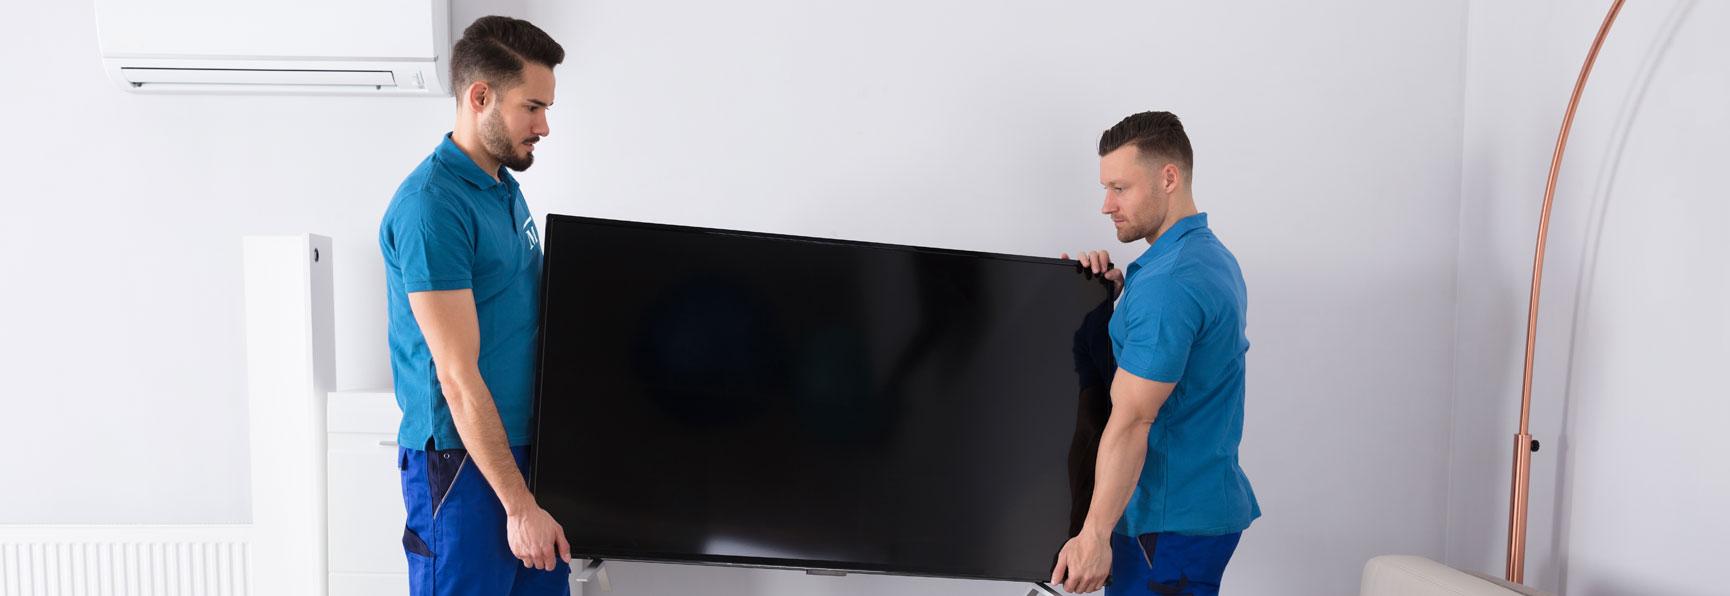 Перевозка телевизора